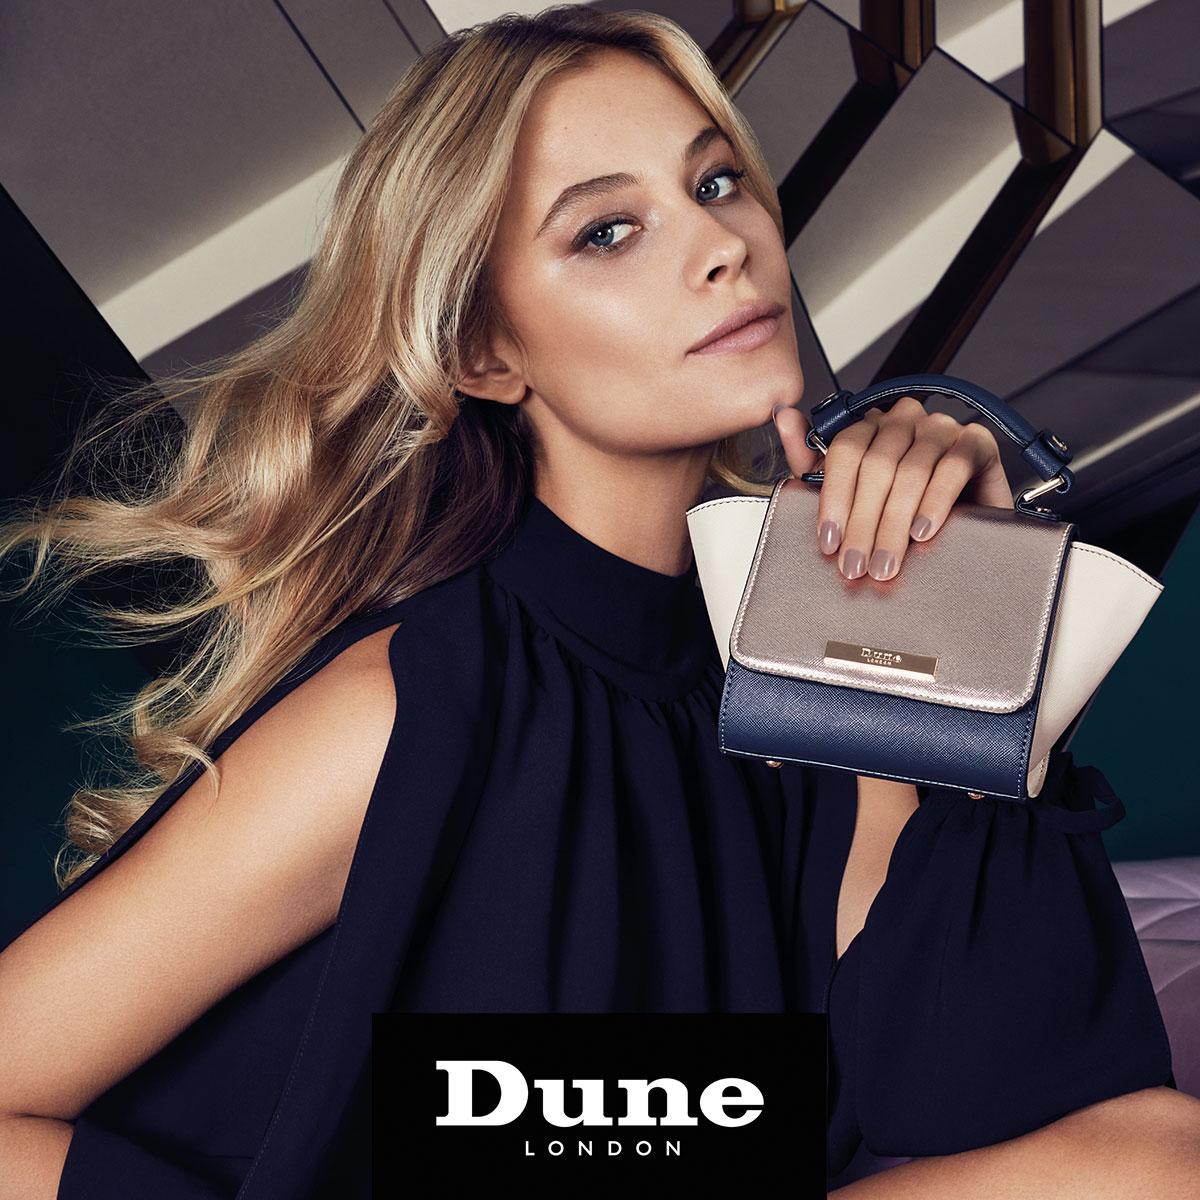 Dune-004.jpg